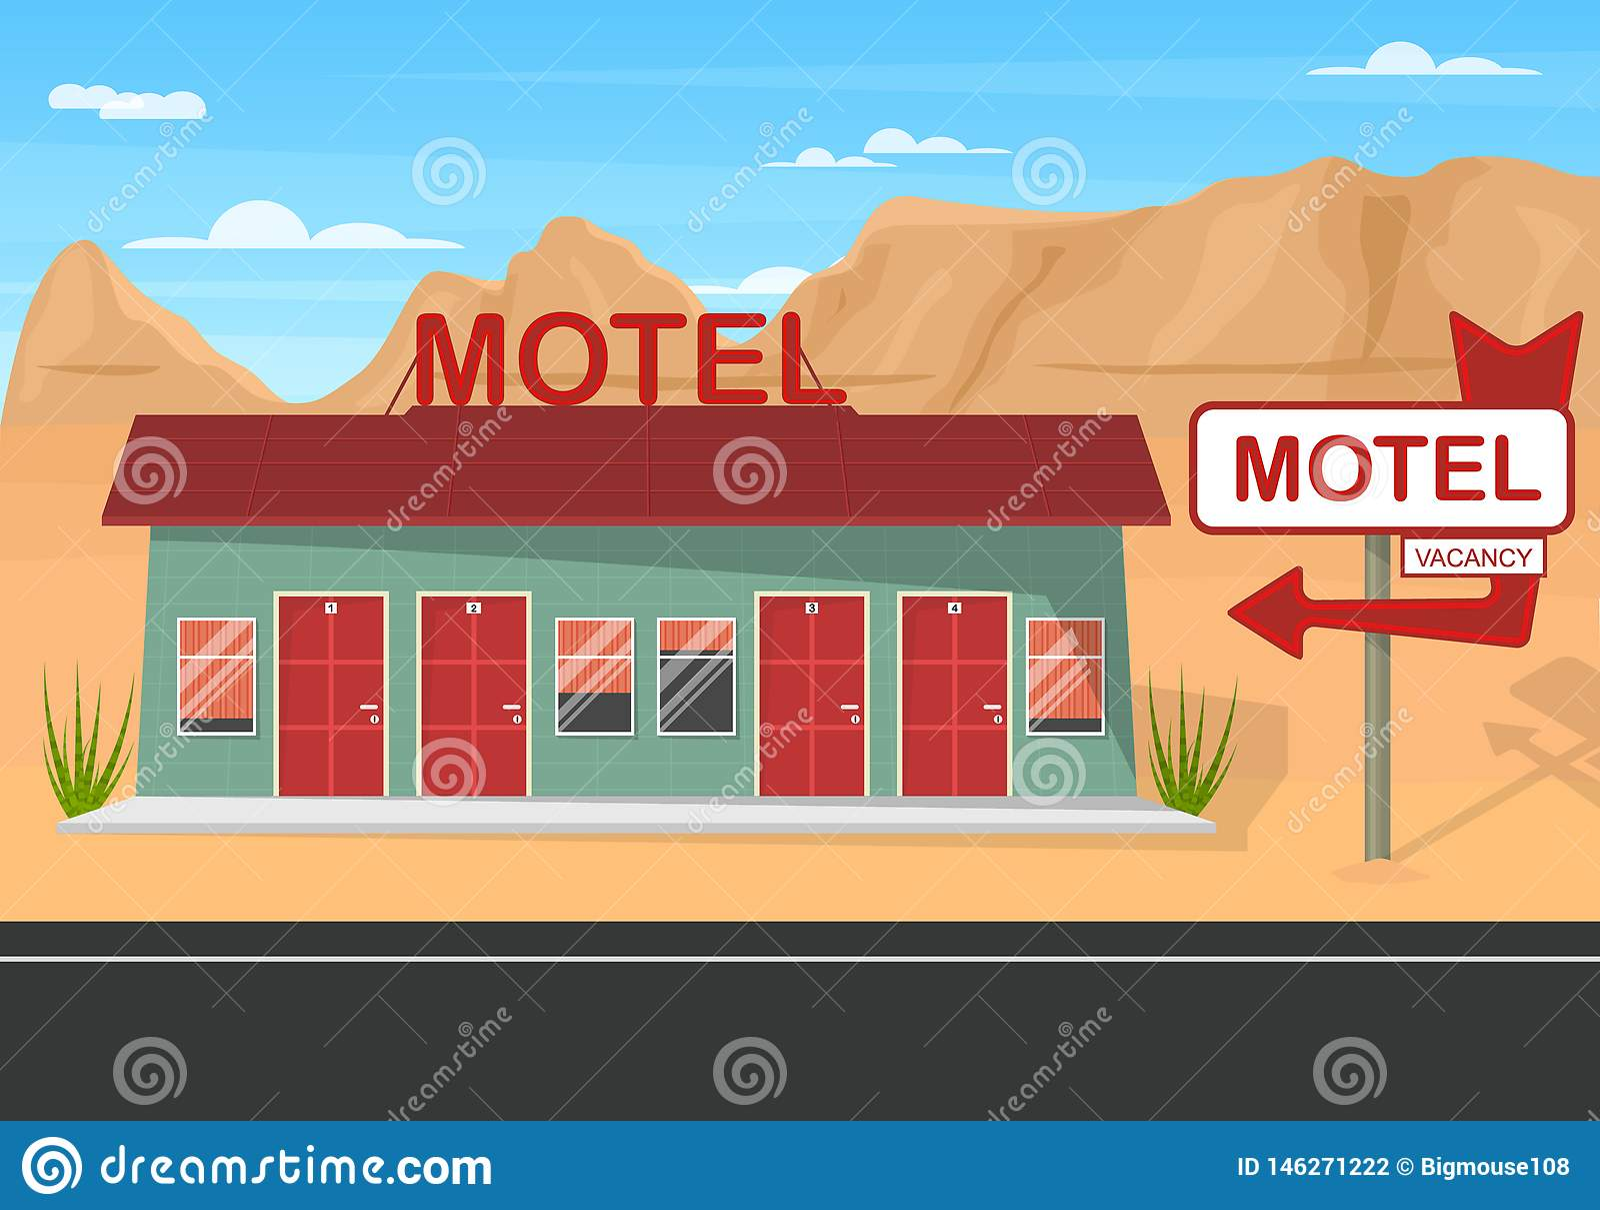 Motel del borde de la carretera de la historieta en un fondo del paisaje Vector